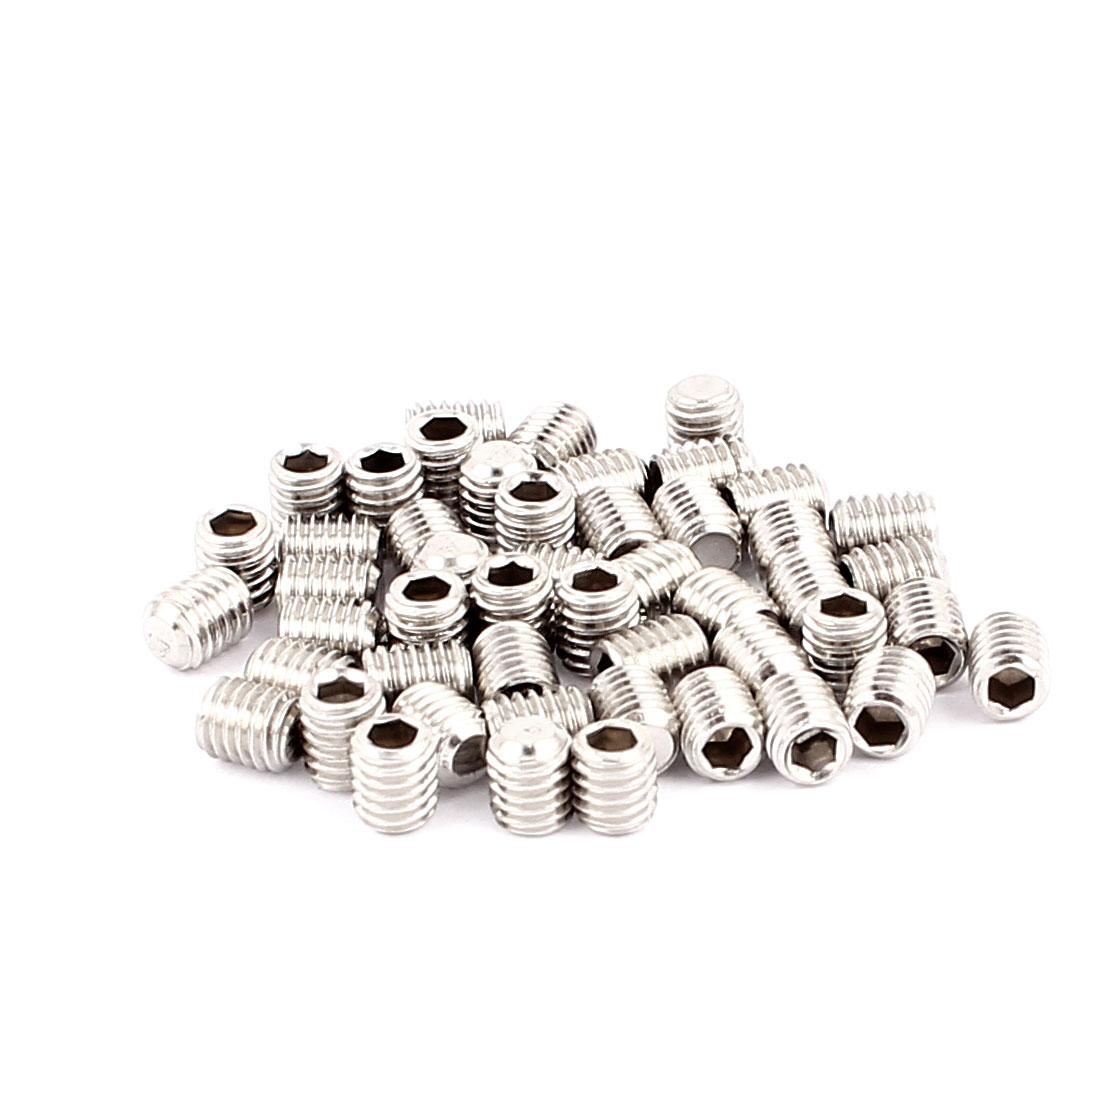 50pcs M5x6mm 304 Stainless Steel Hex Socket Flat Point Set Grub Screws